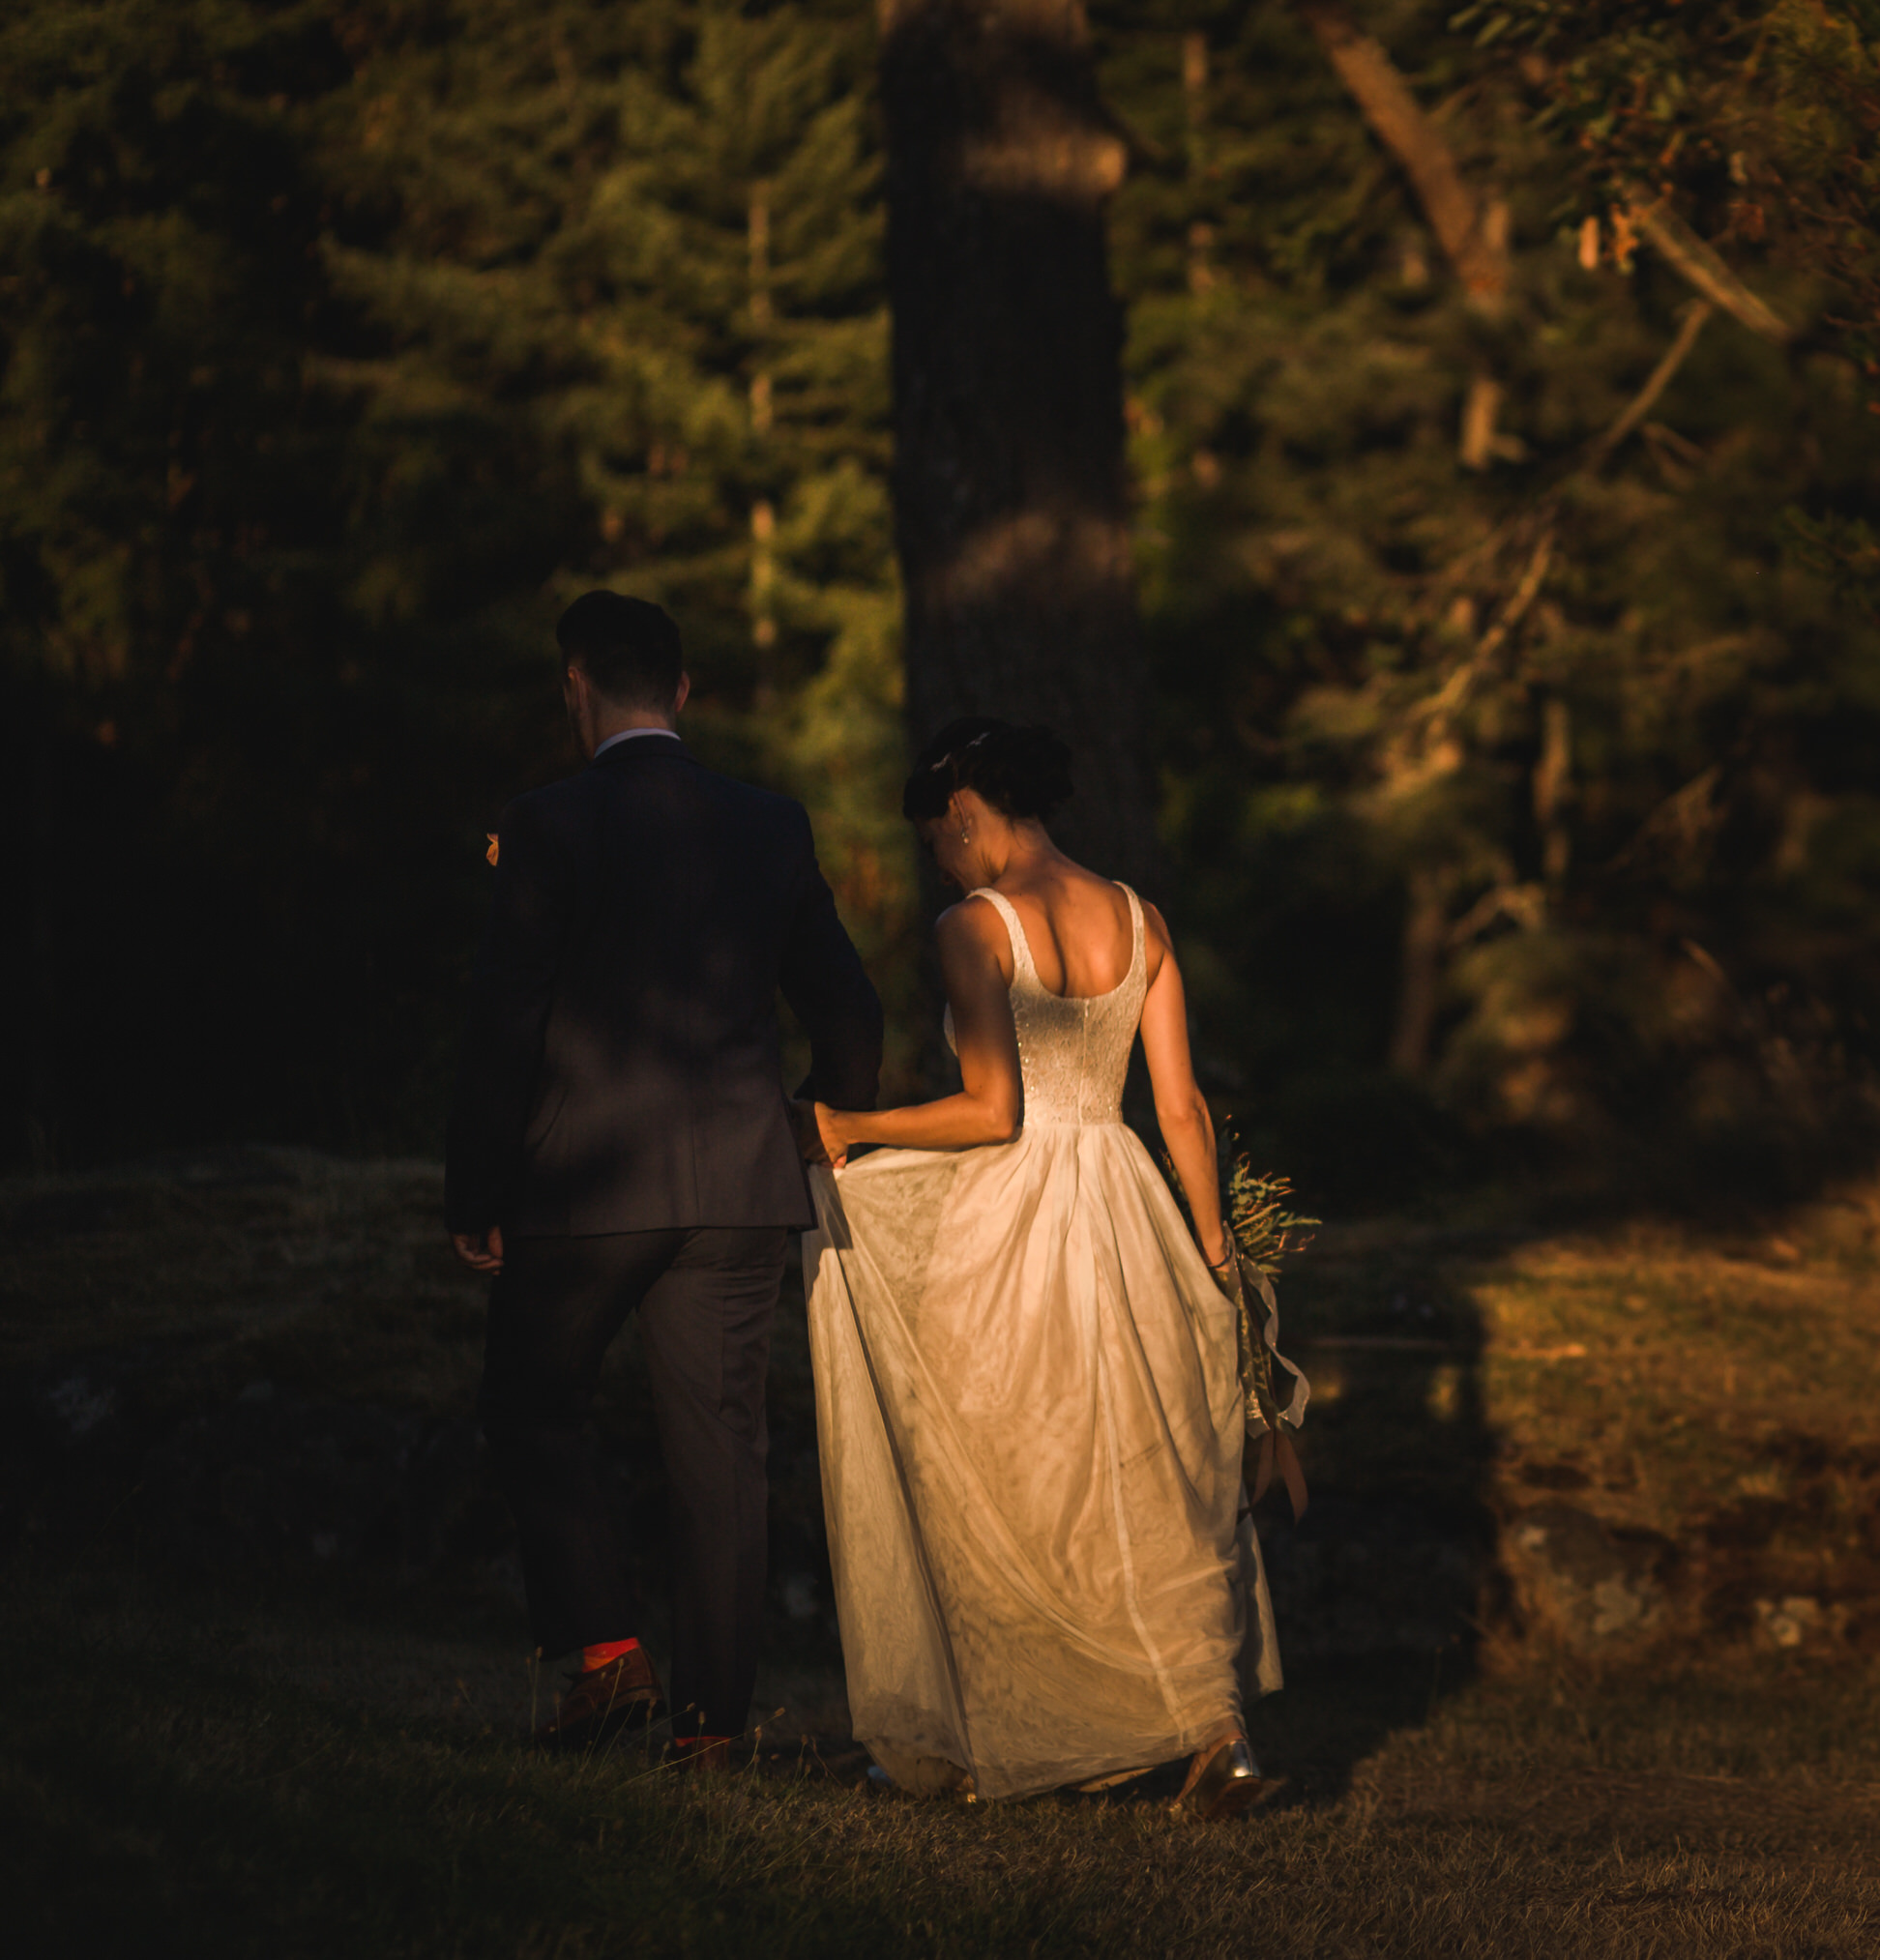 Rockwater Secret Cove Resort Wedding - Sunshine Coast BC Wedding Photographer - Vancouver Wedding Photographer - Sunshine Coast Elopement Photos - IMG_2151.jpg